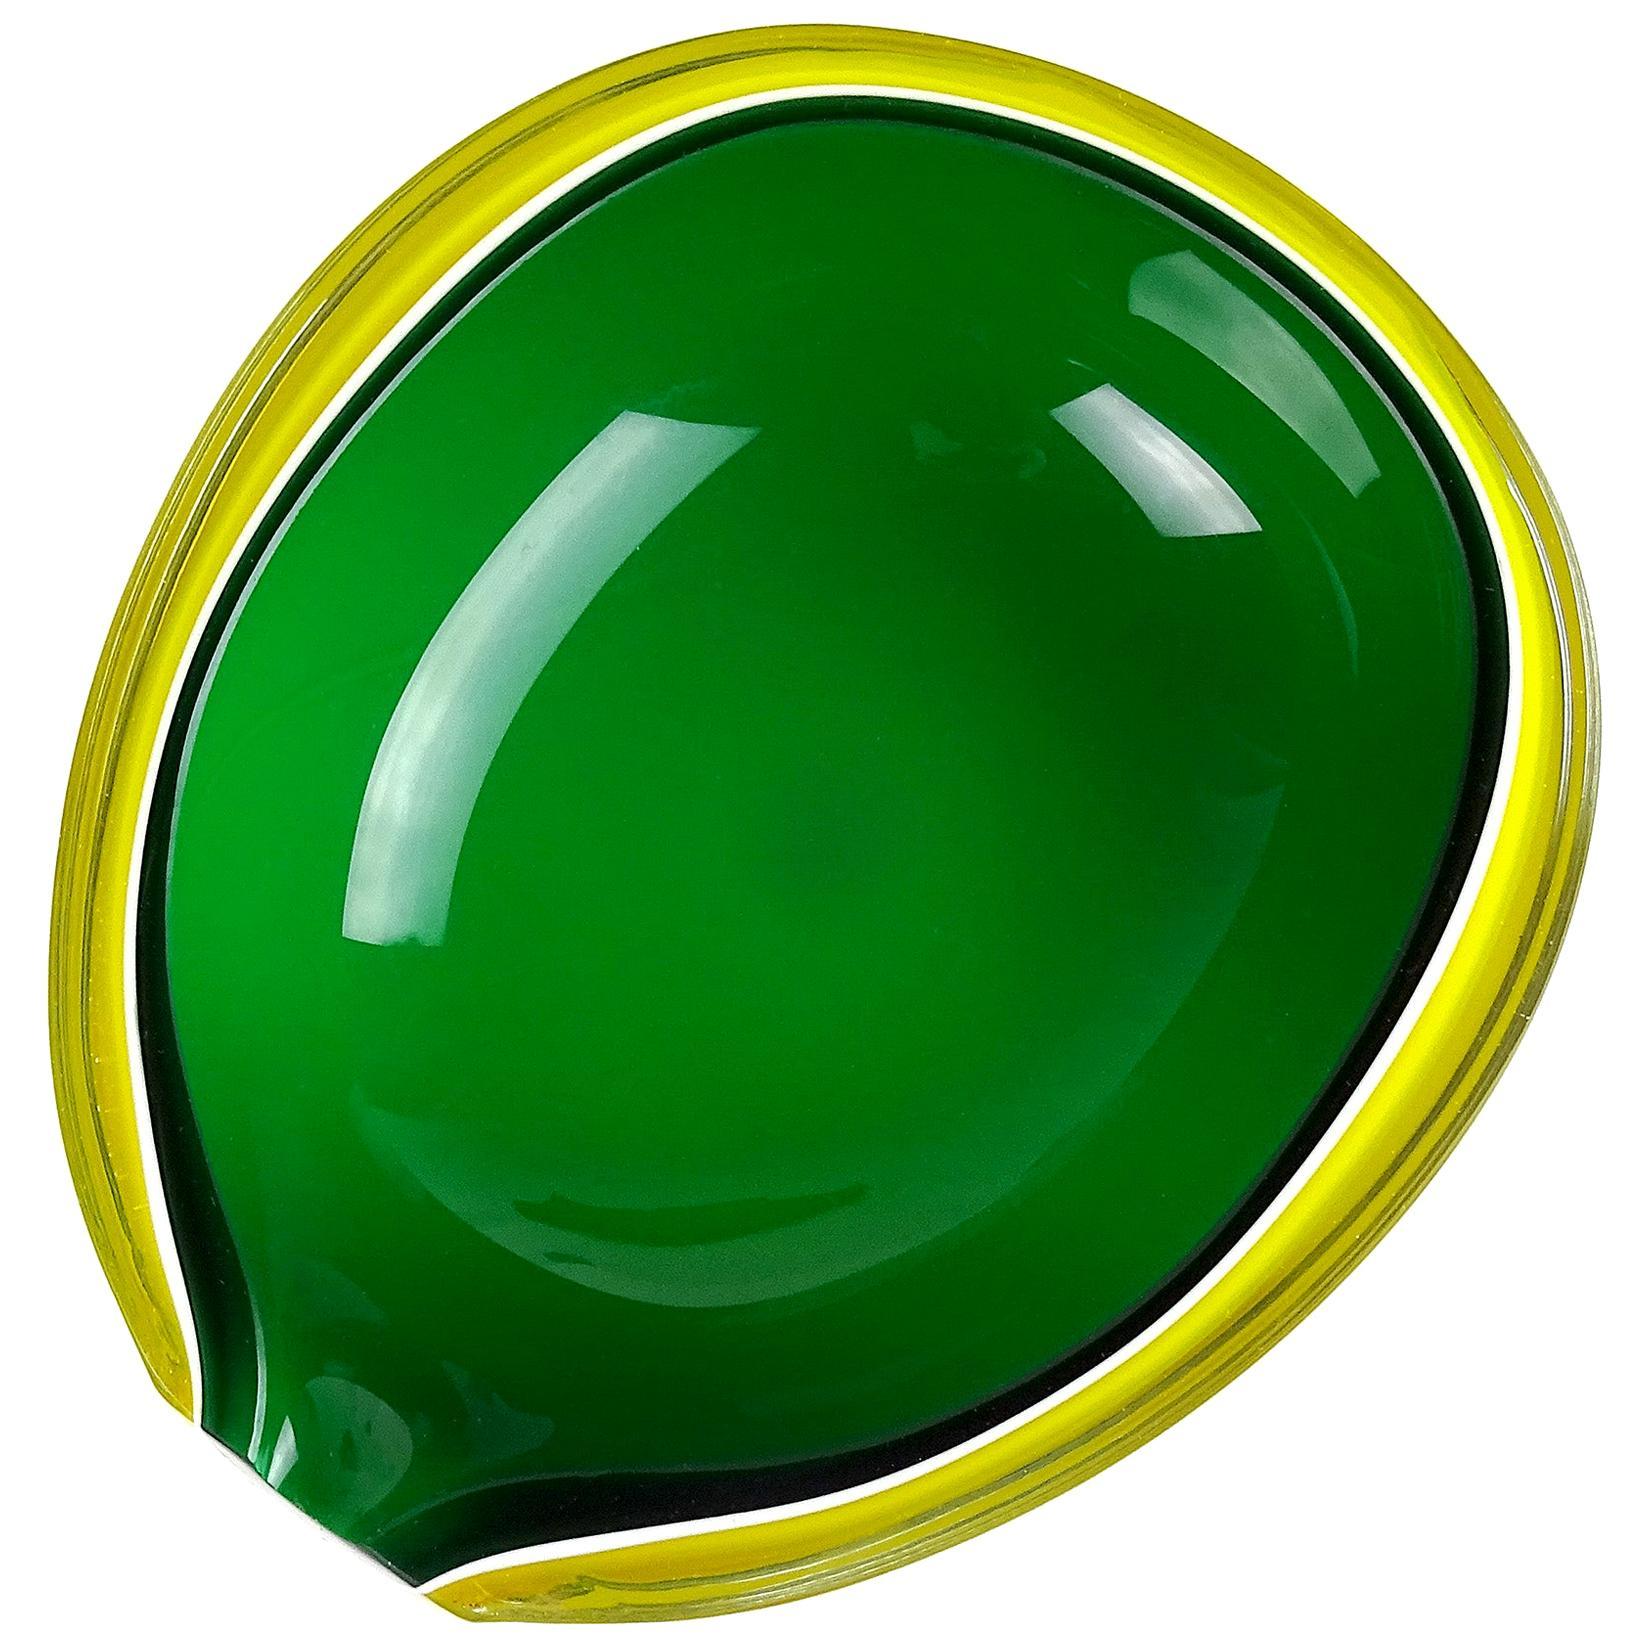 Fratelli Toso Murano Yellow Green Italian Art Glass Melon Cut Decorative Bowl